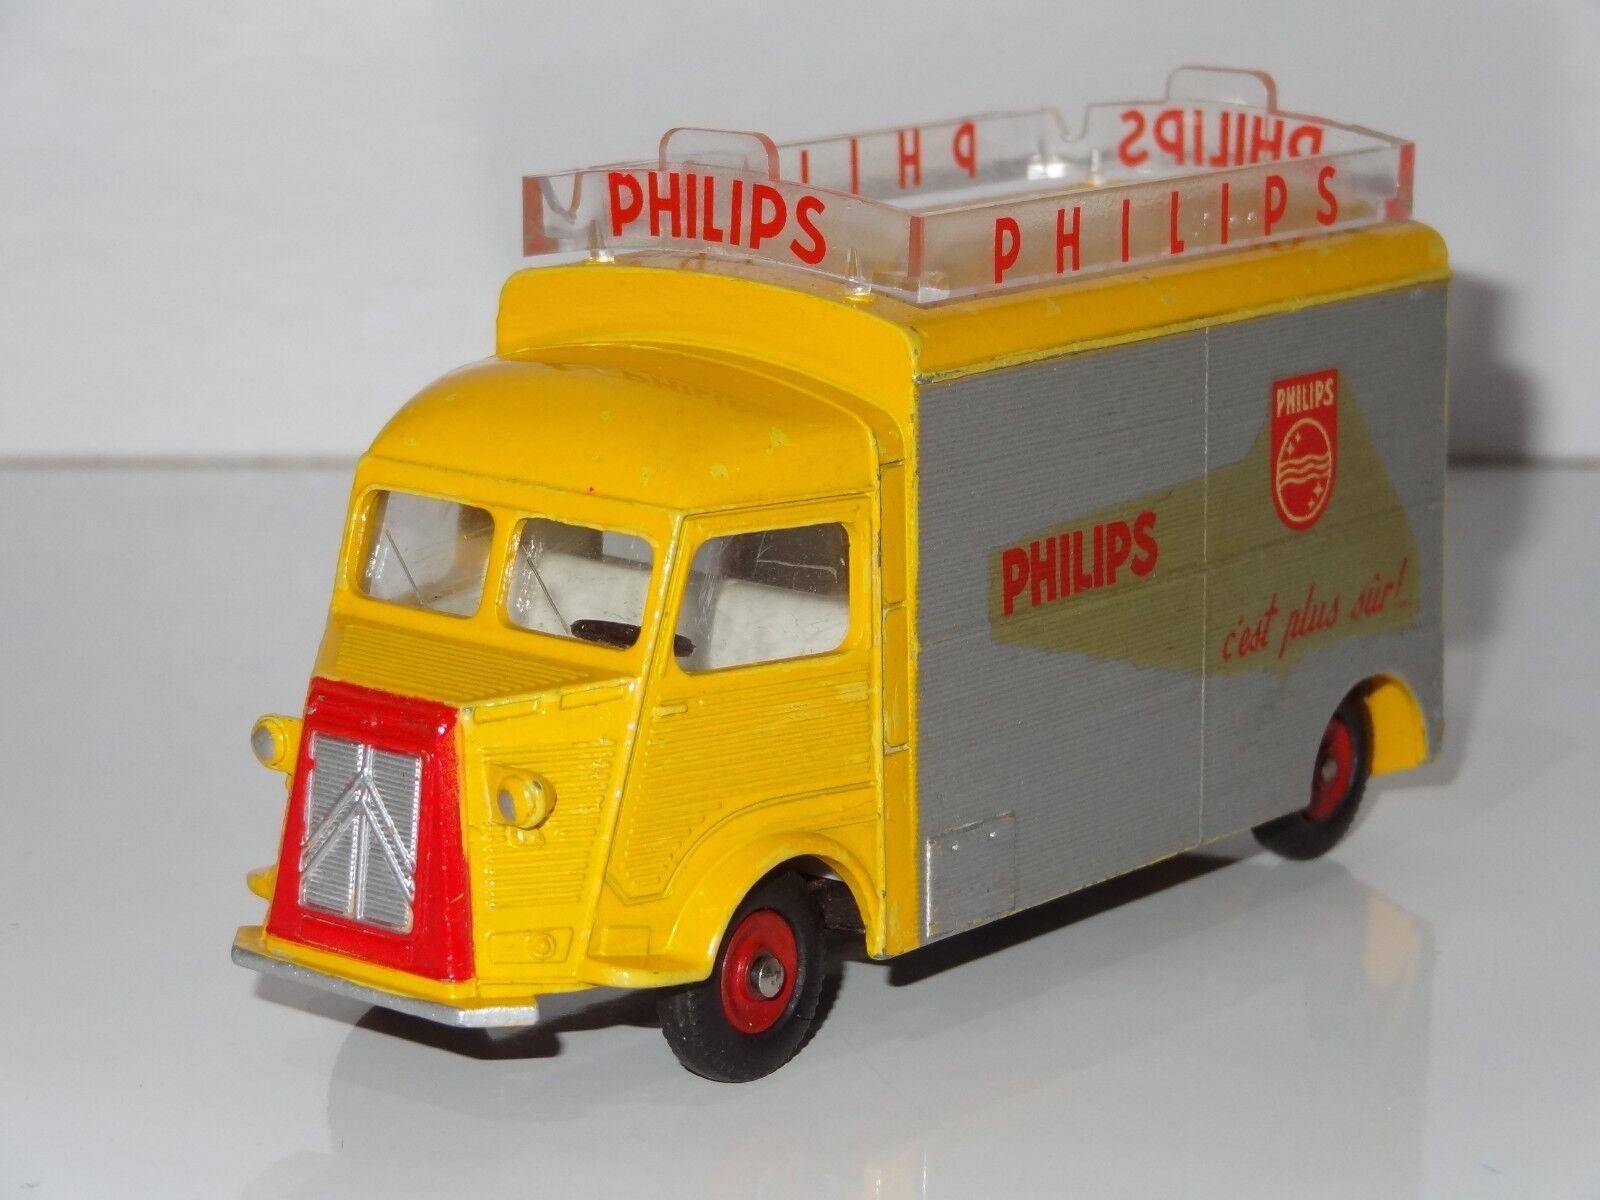 V) Exposición H H H de diekit Citron en Francia van Phillips - 587 7b7